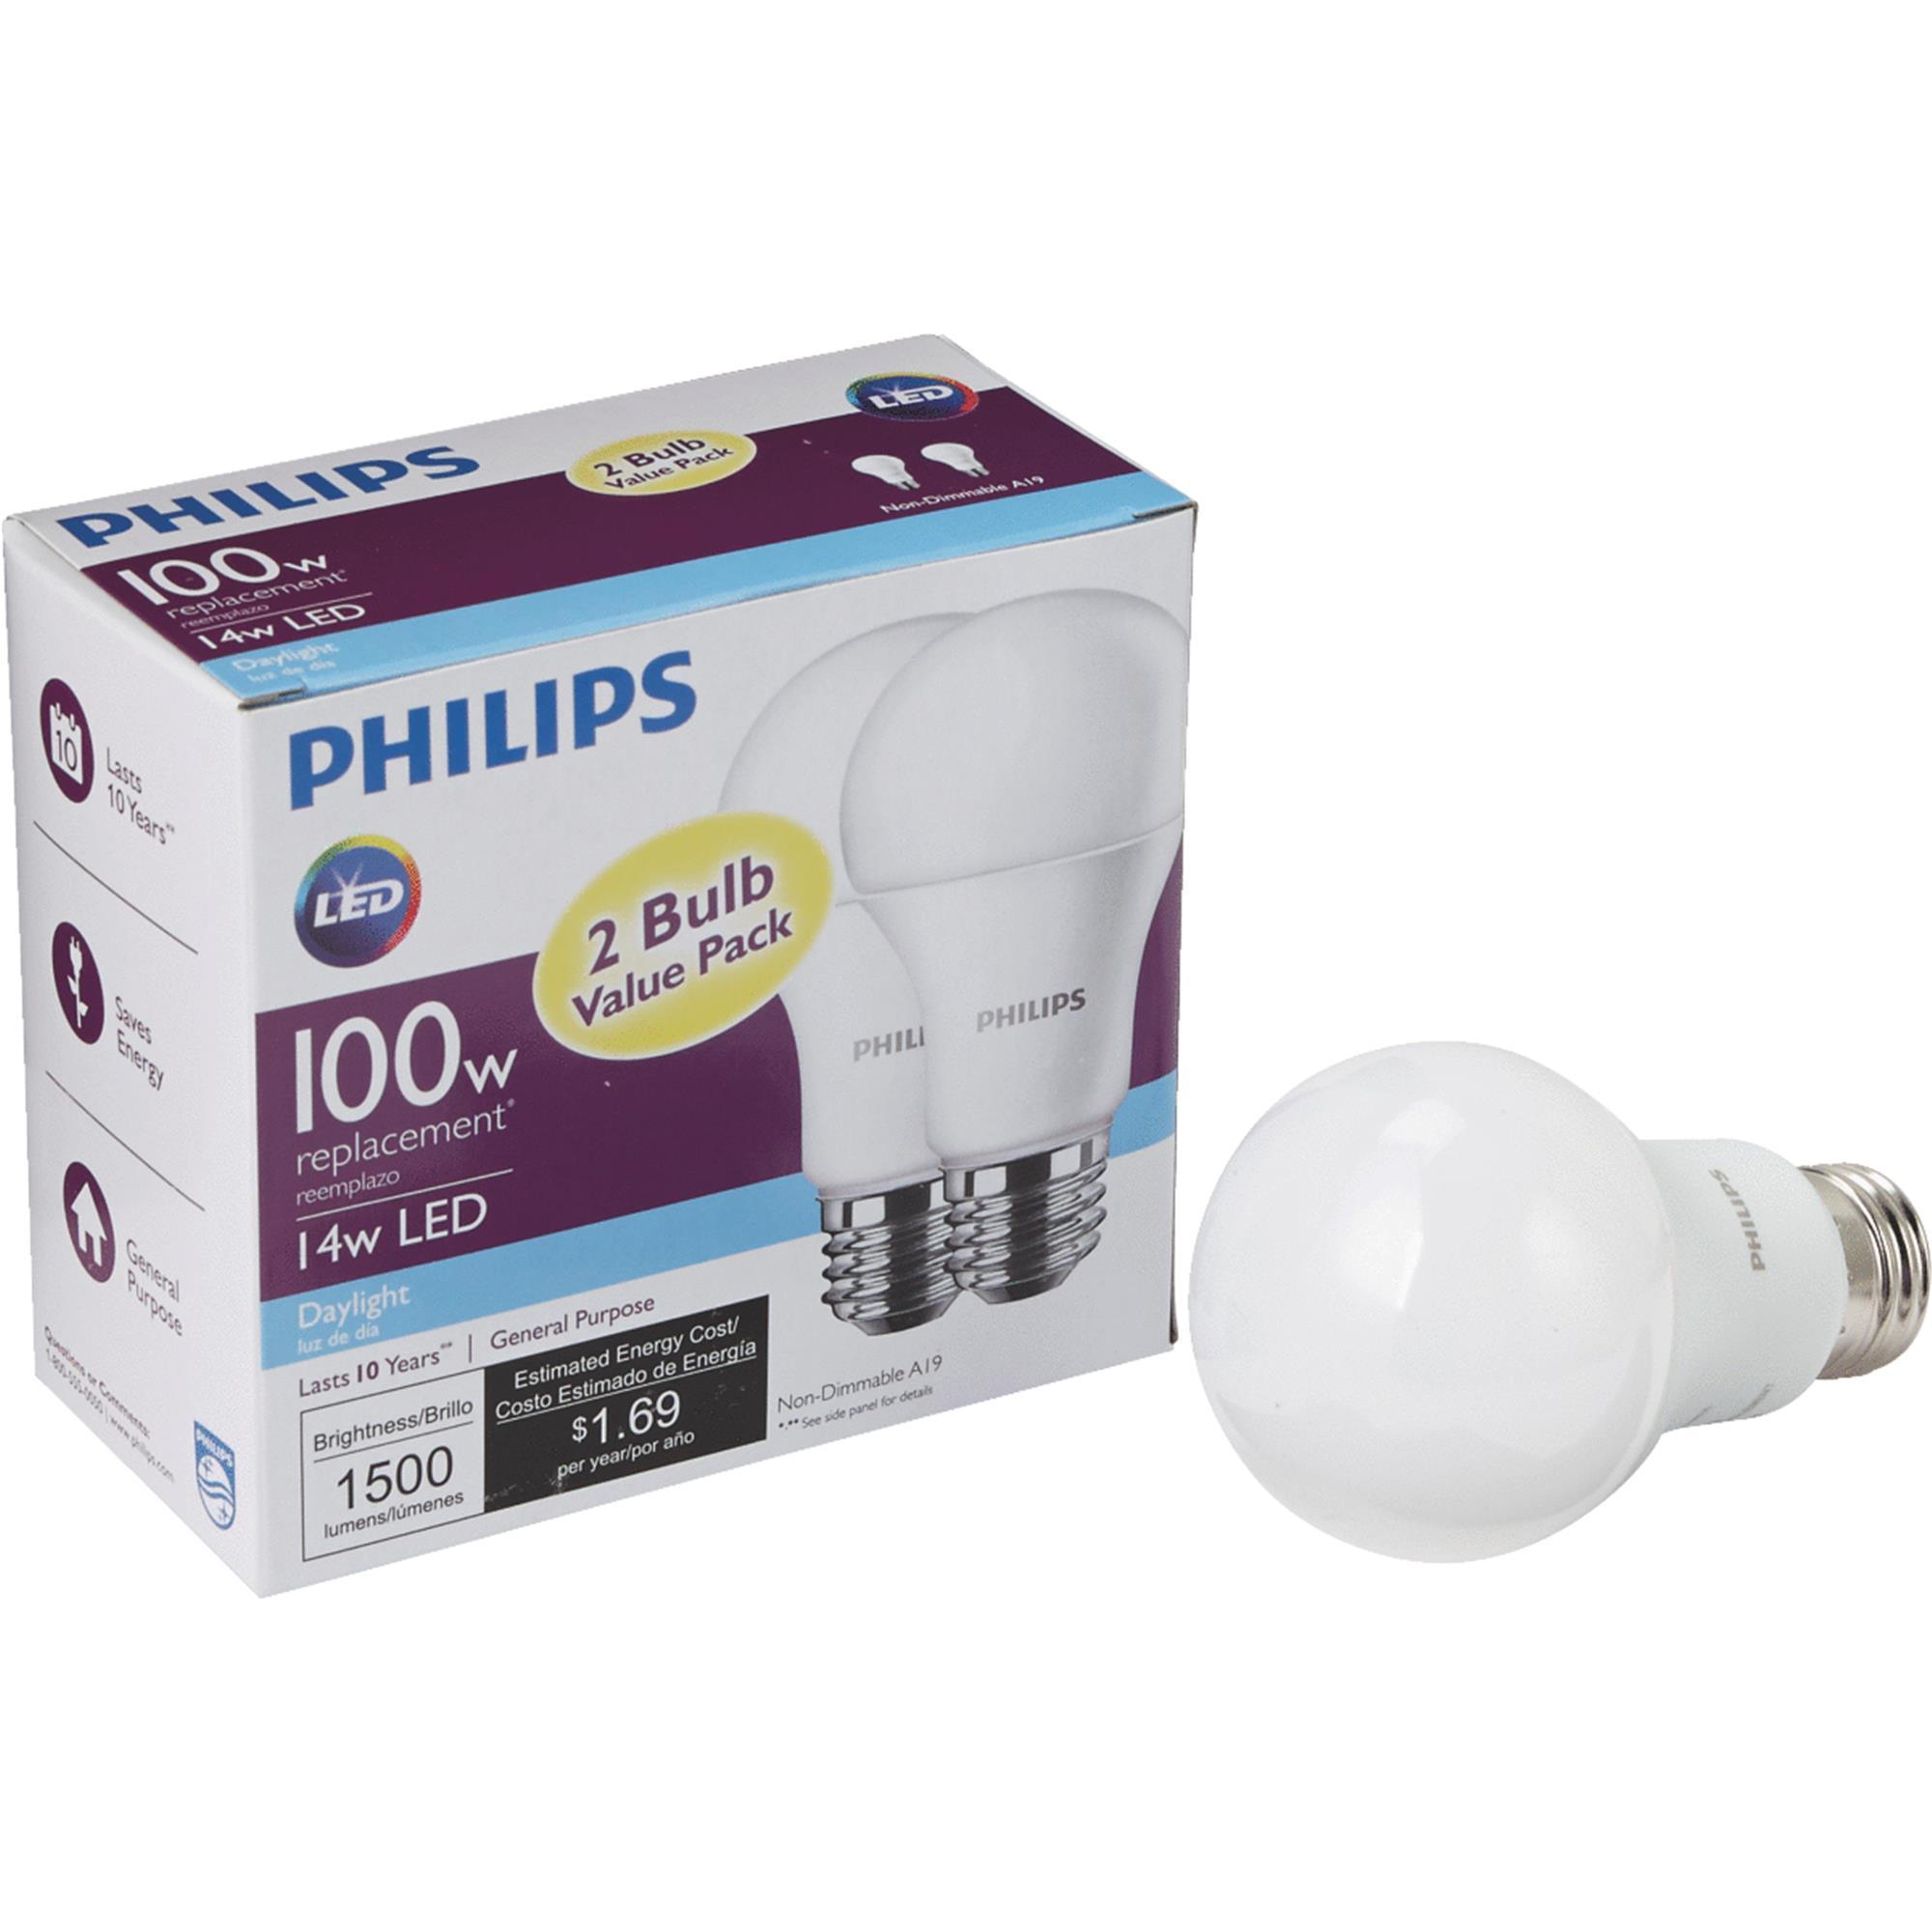 Philips LED 14W (100 Watt Equivalent) Daylight Standard ...